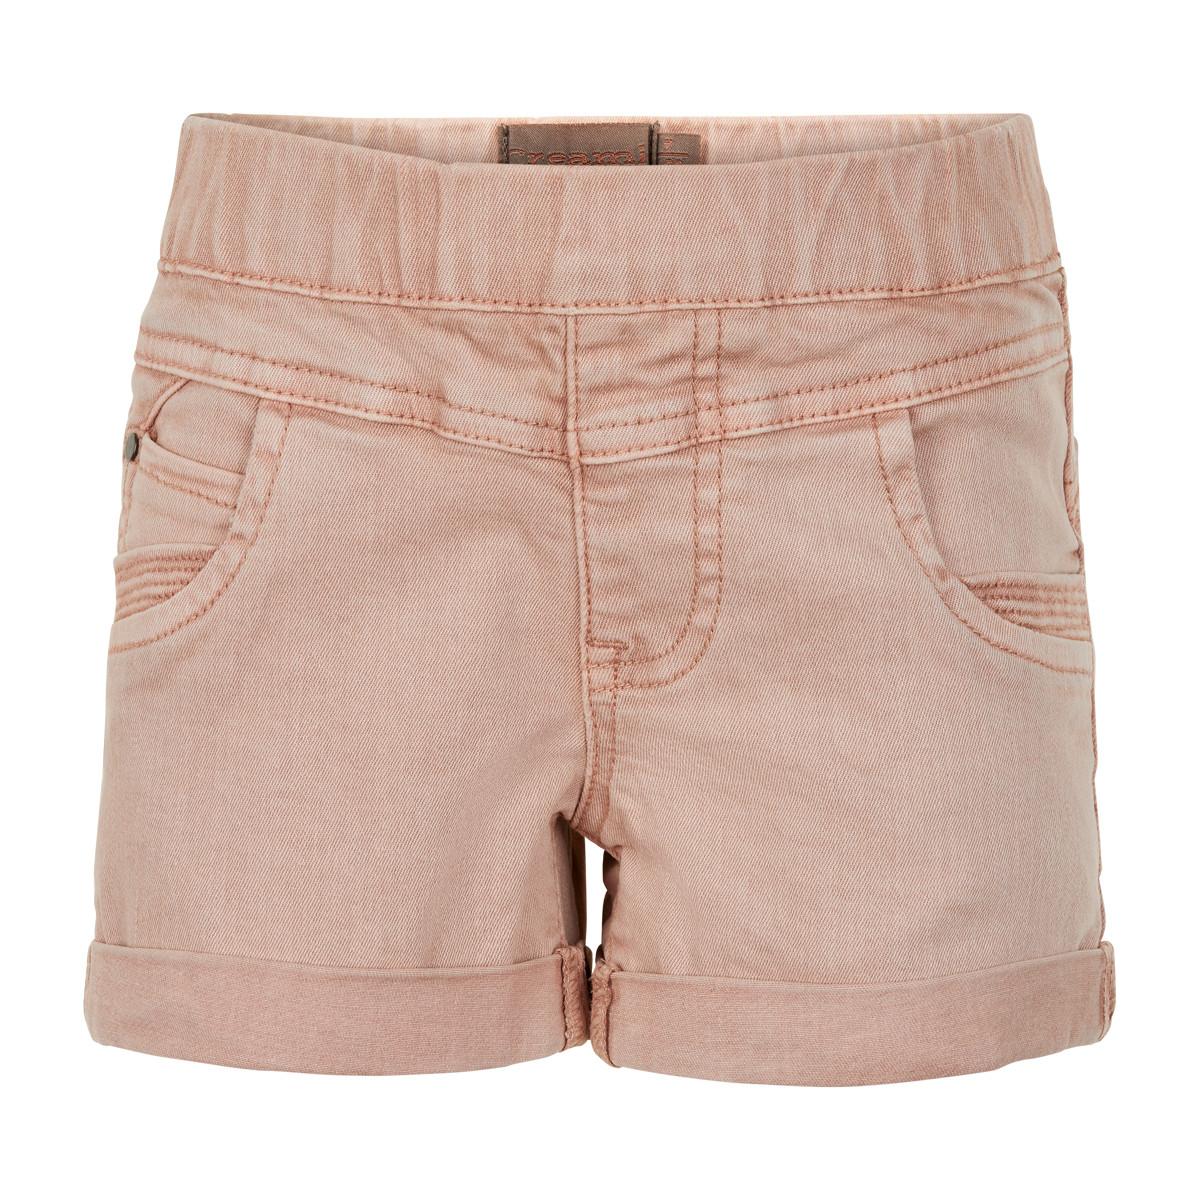 Creamie   Shorts   4-14y   821087-5506